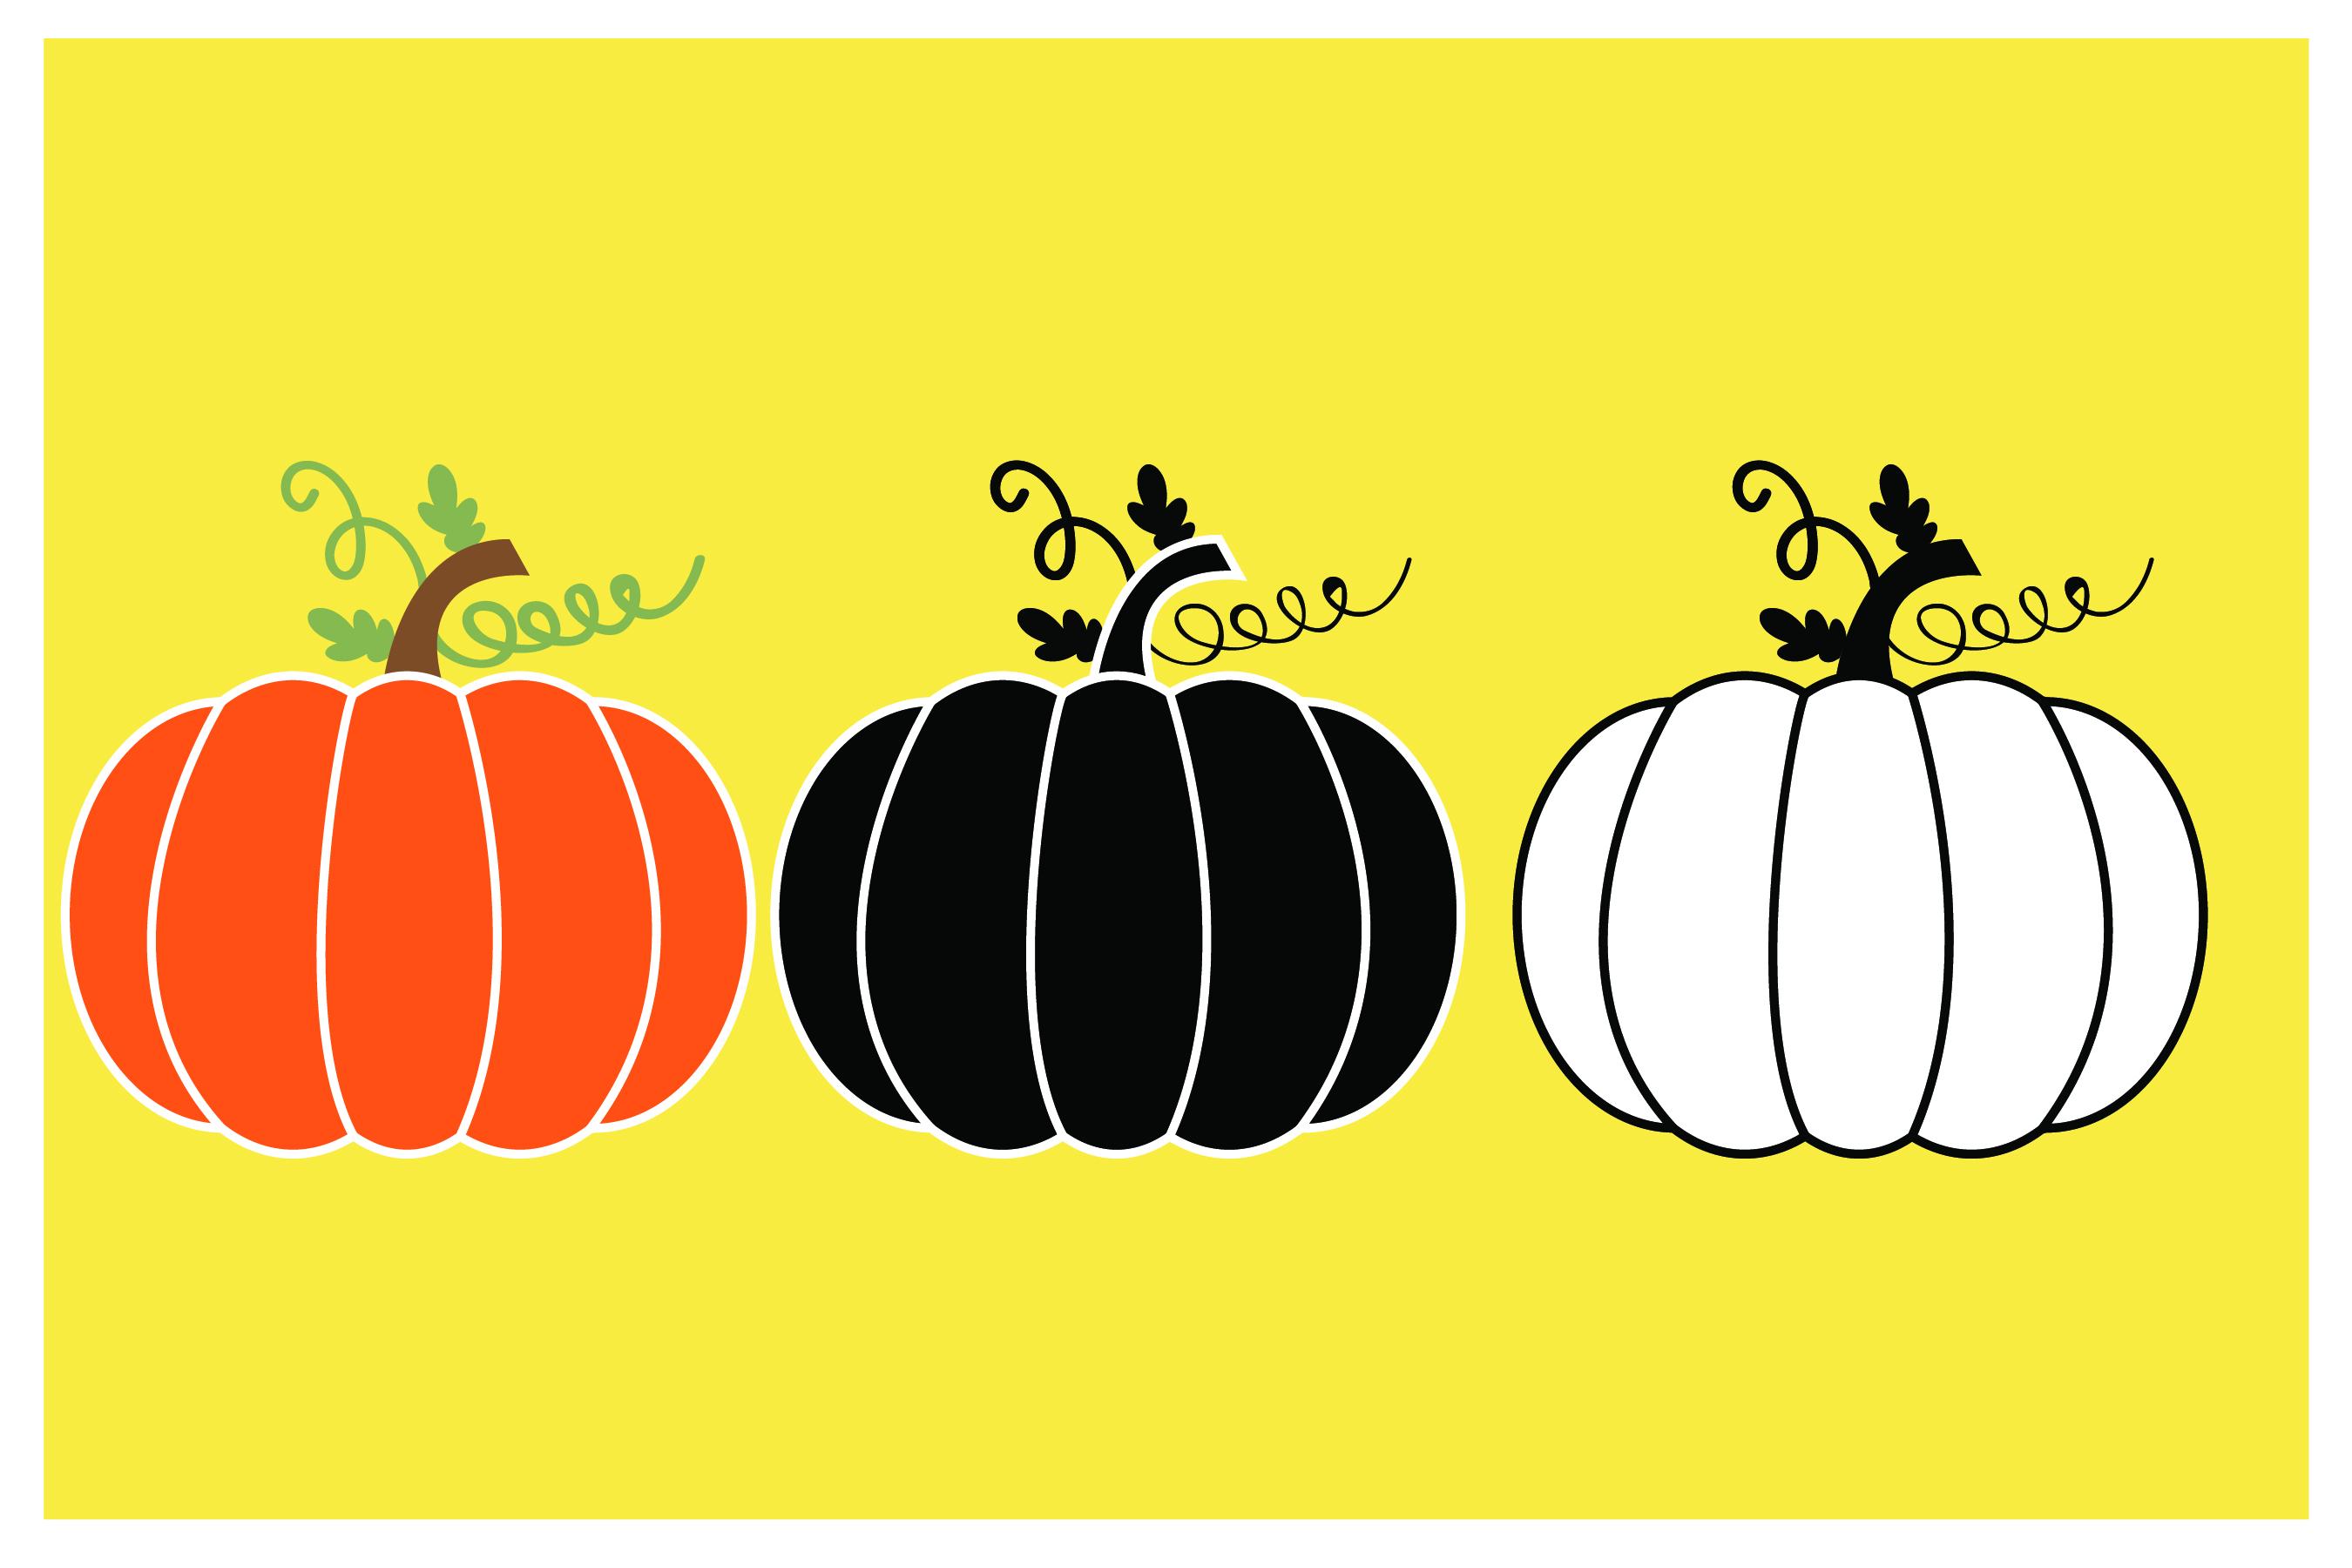 Pumpkin 3 Design - SVG Cut File - T shirt , Mug,Design example image 2